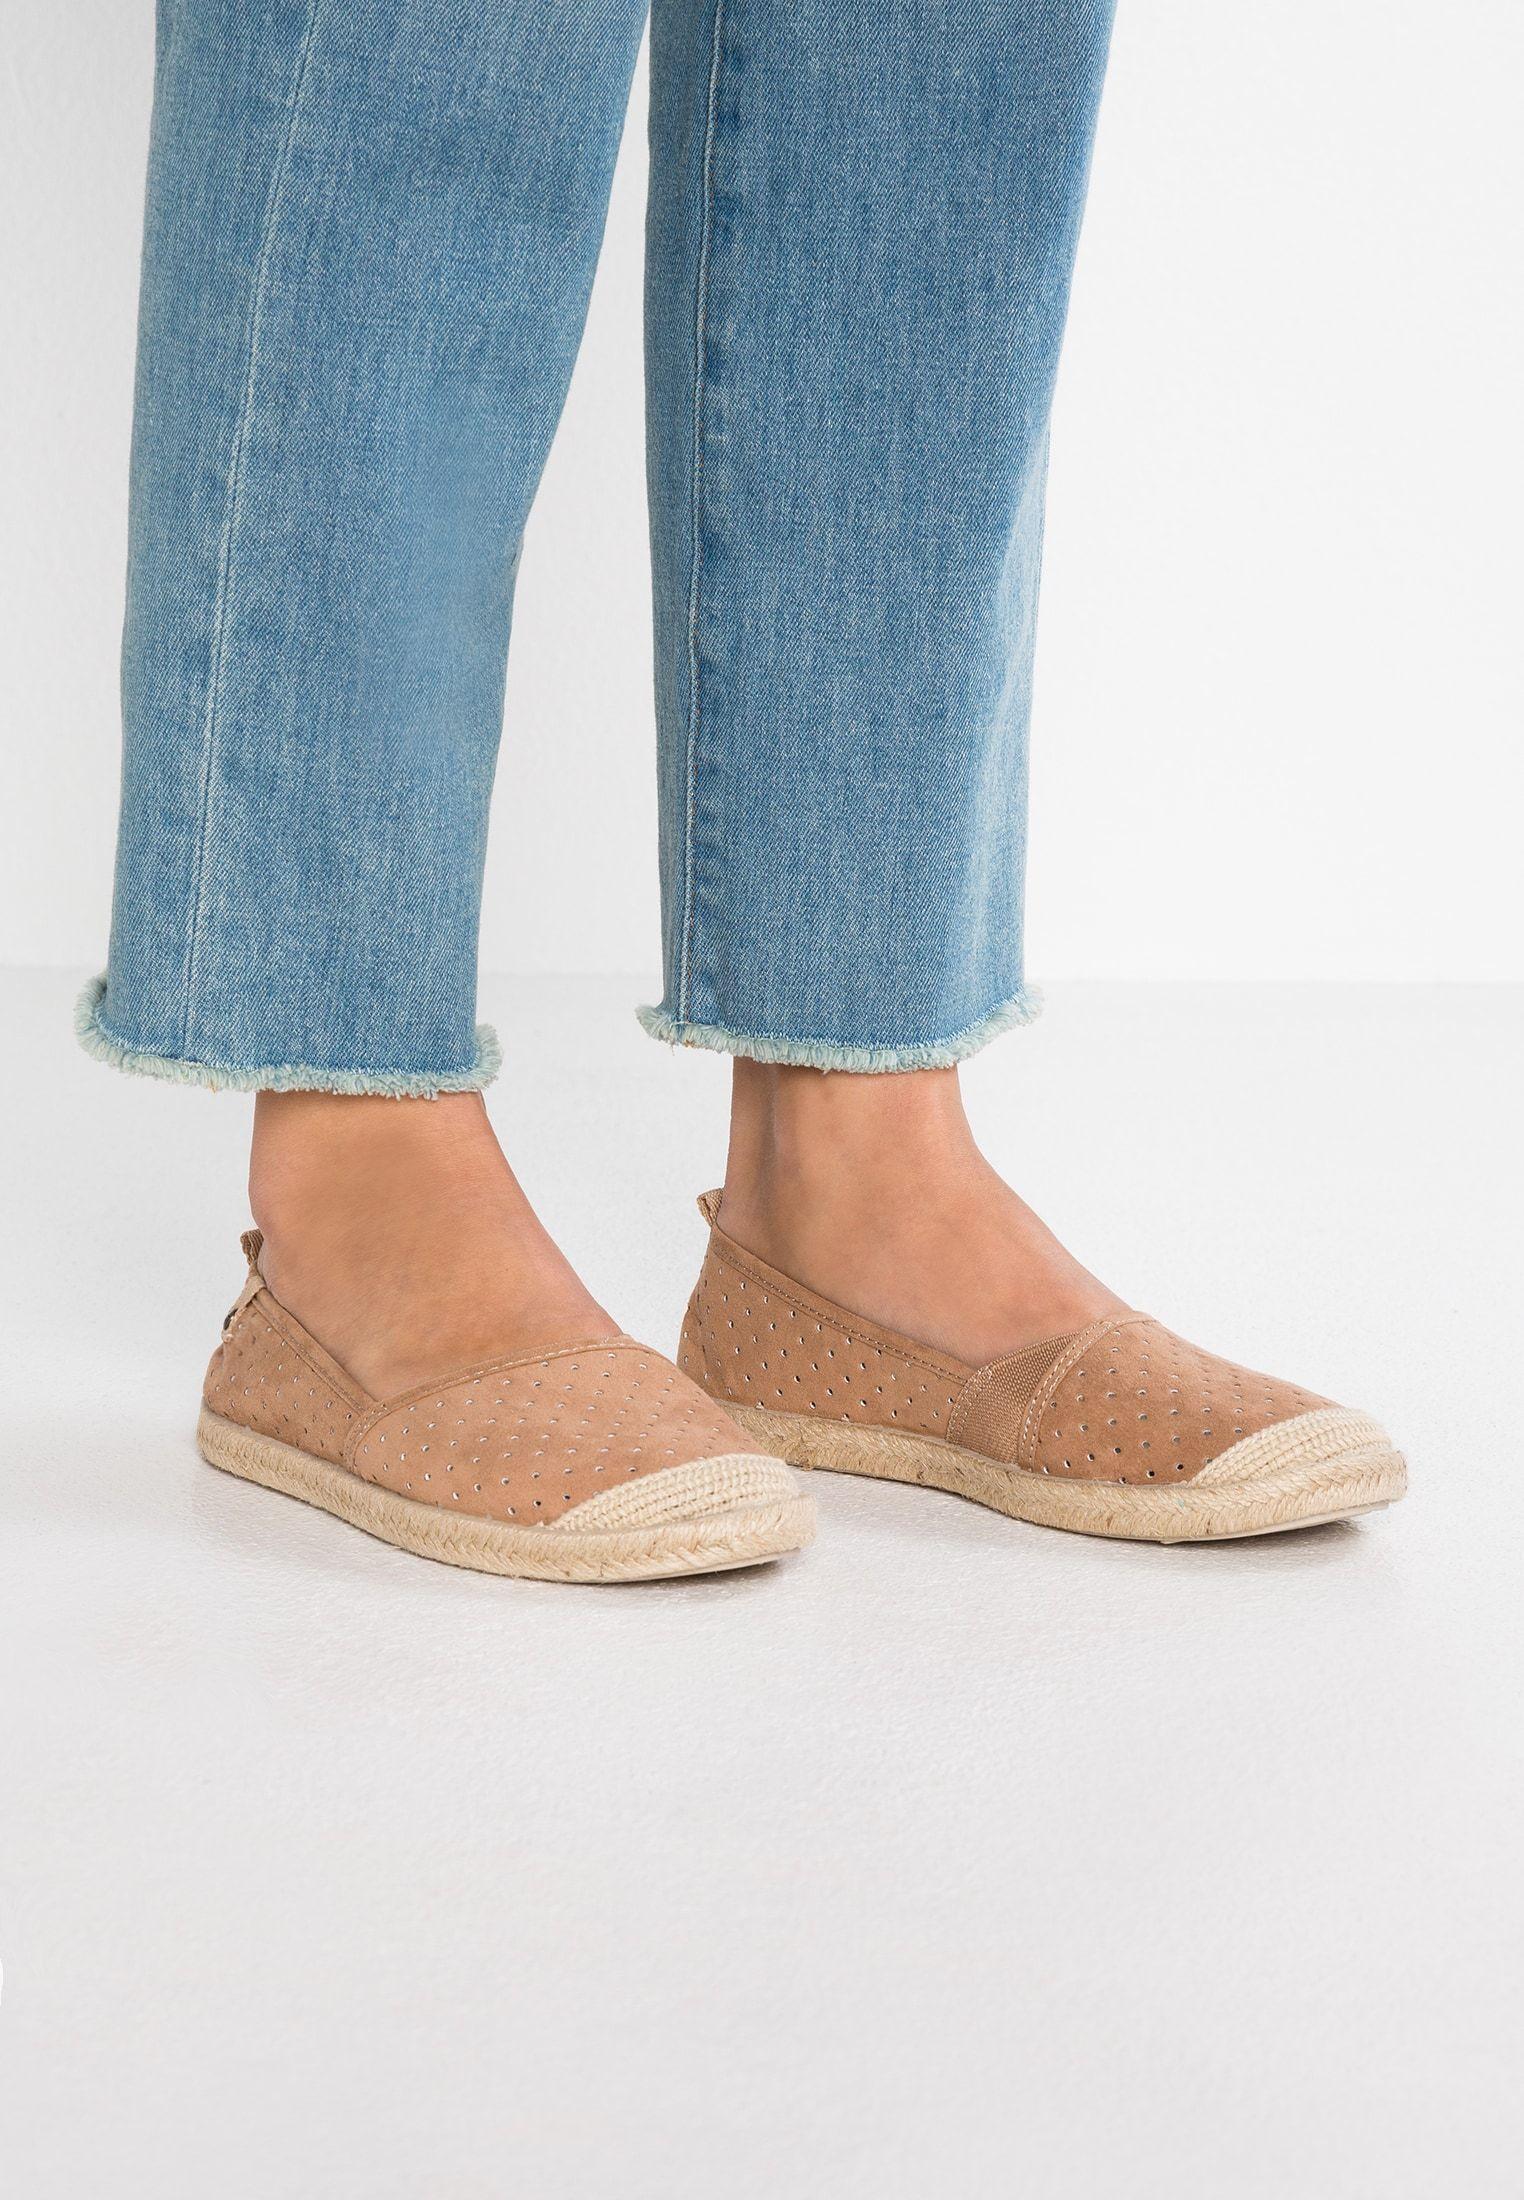 Roxy Florall Espadryle Brown Zalando Pl Espadrilles Shoes Flat Espadrille